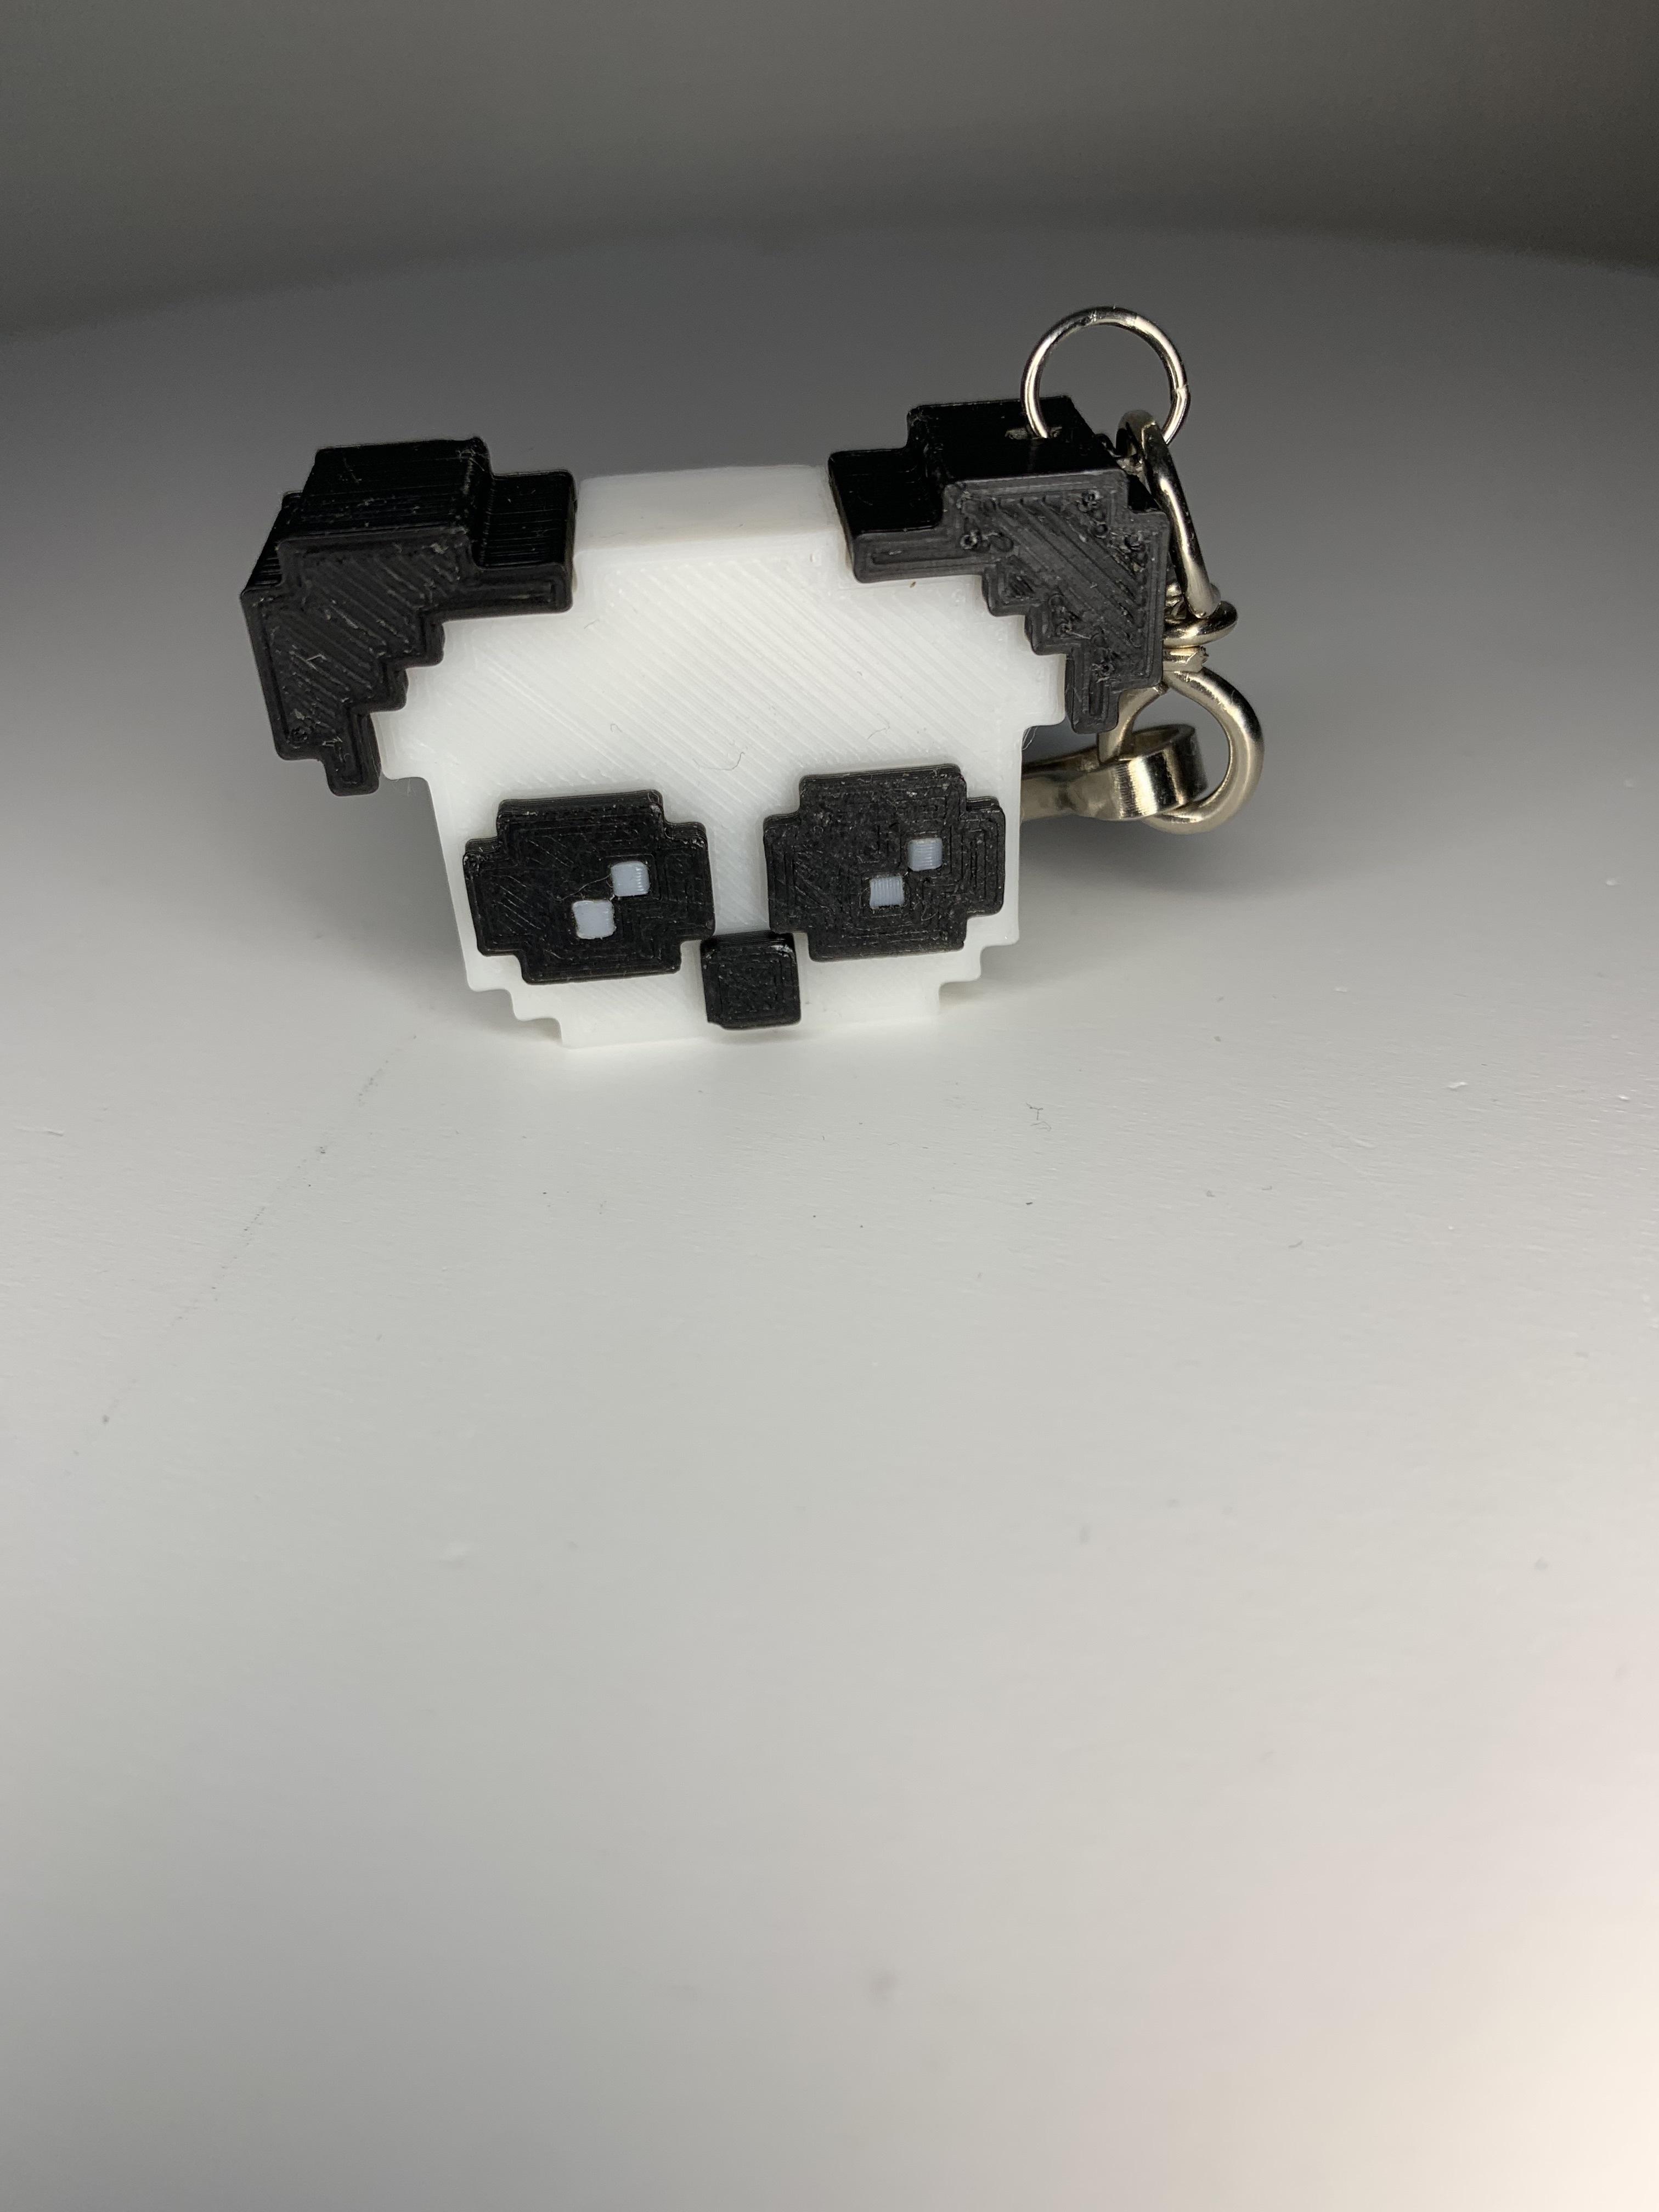 A0275841-59FC-4376-B047-F83FE009B237.jpeg Download OBJ file Panda & Keychains • 3D printable template, Ultipression3D